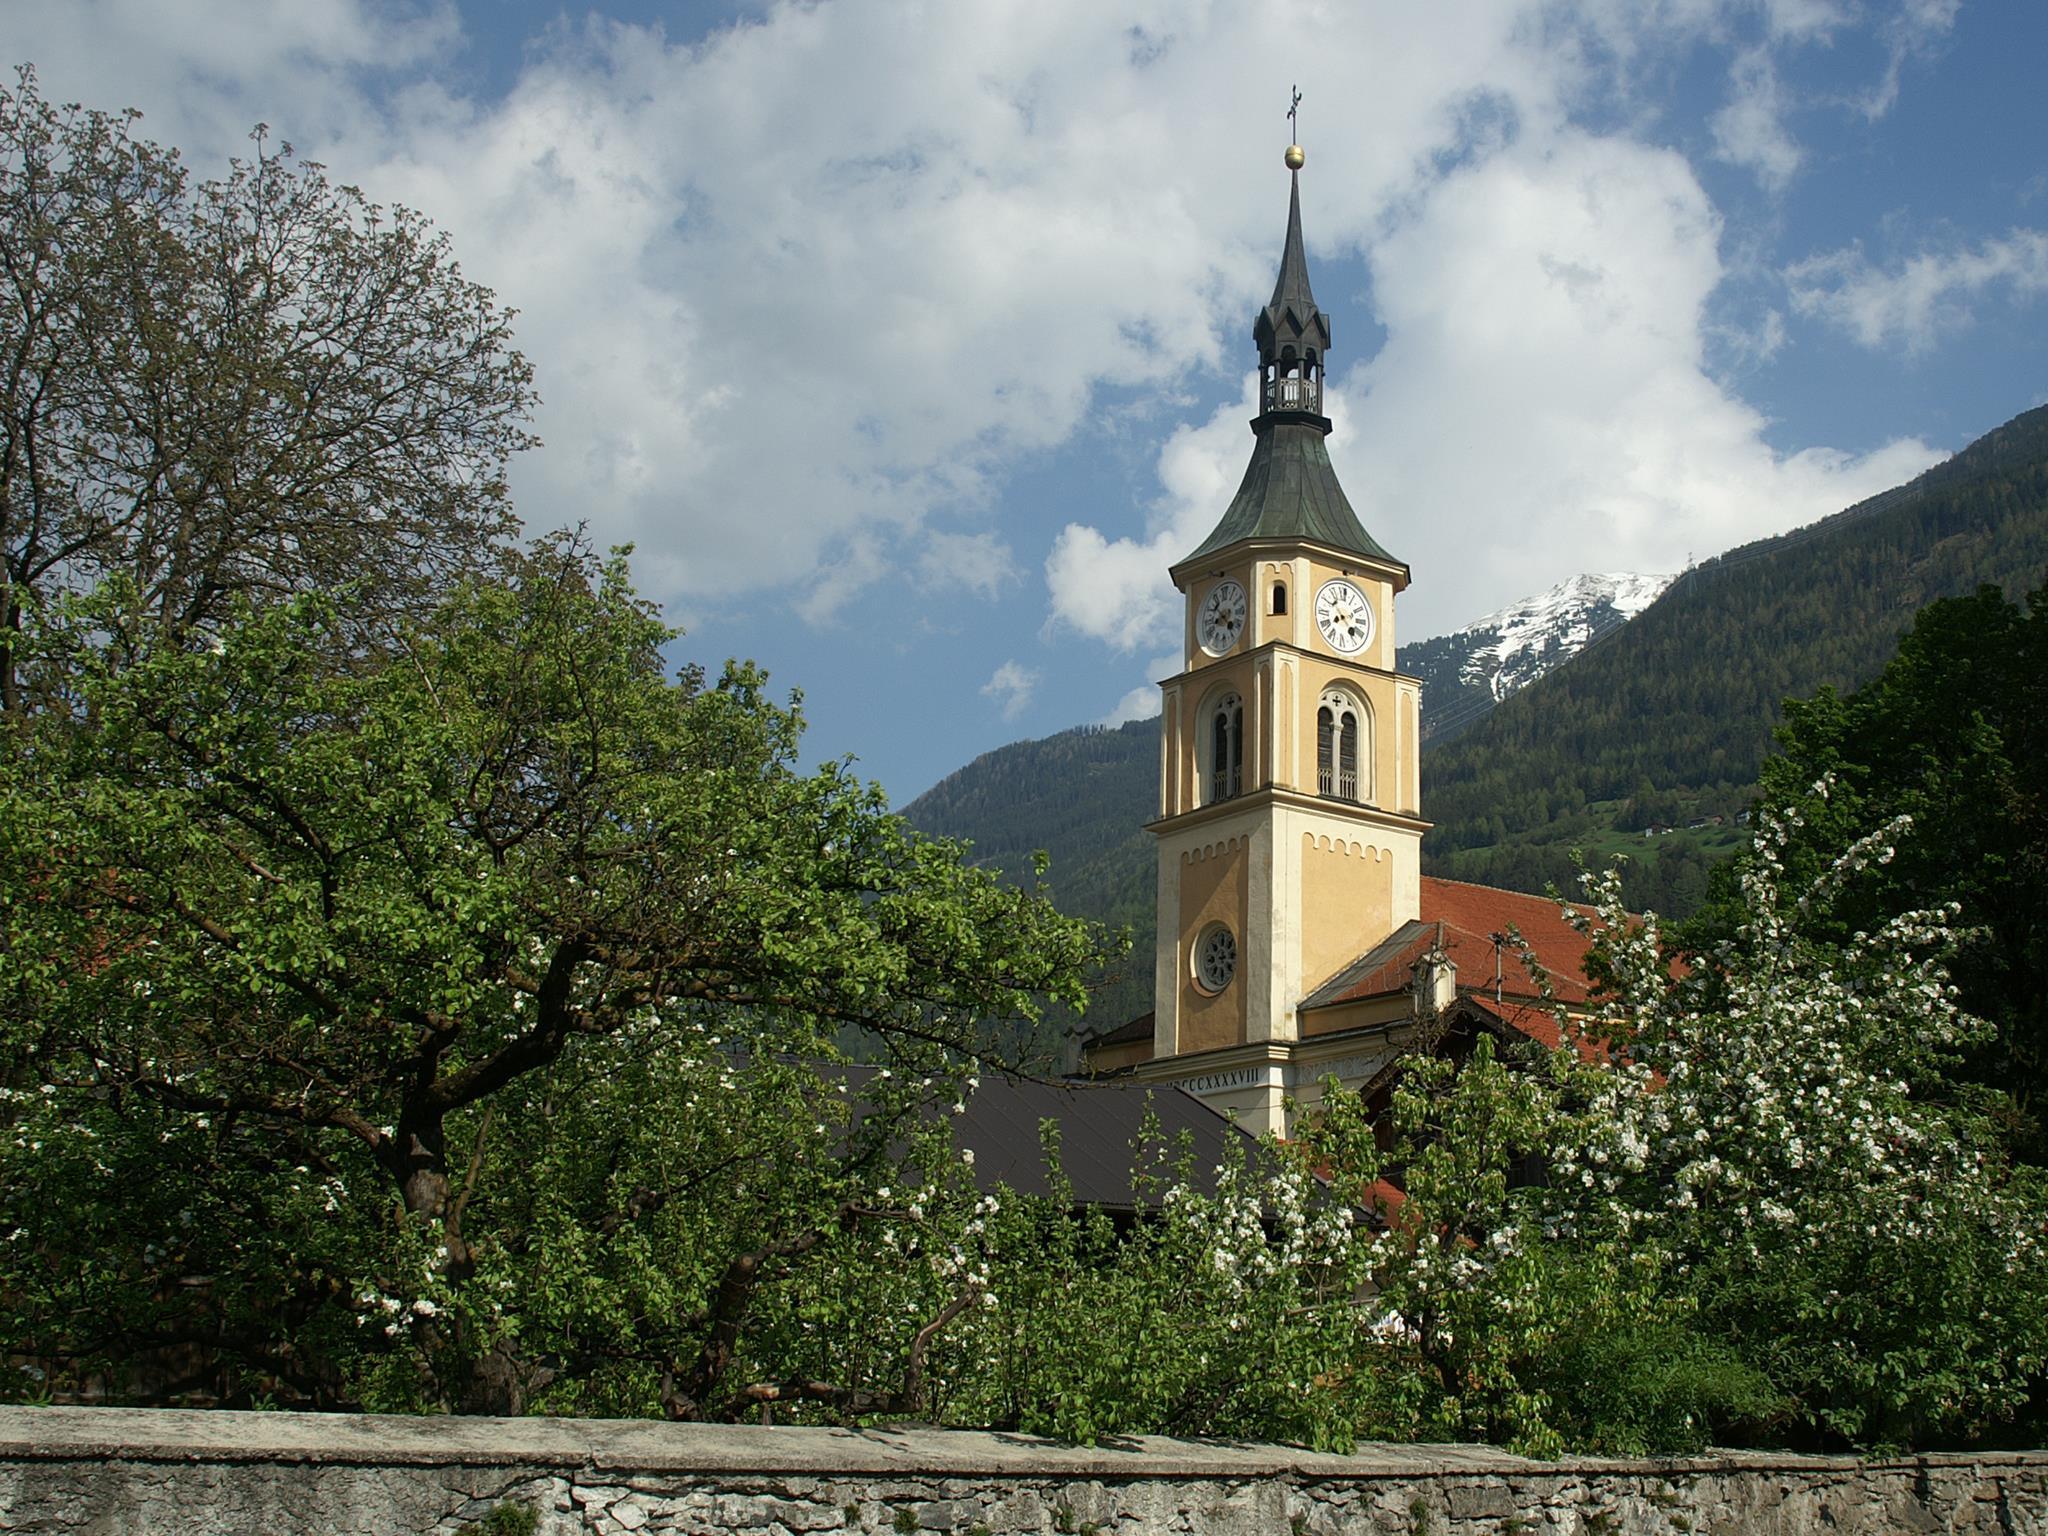 Pfarrkirche Hl. Apostel Petrus & Paulus